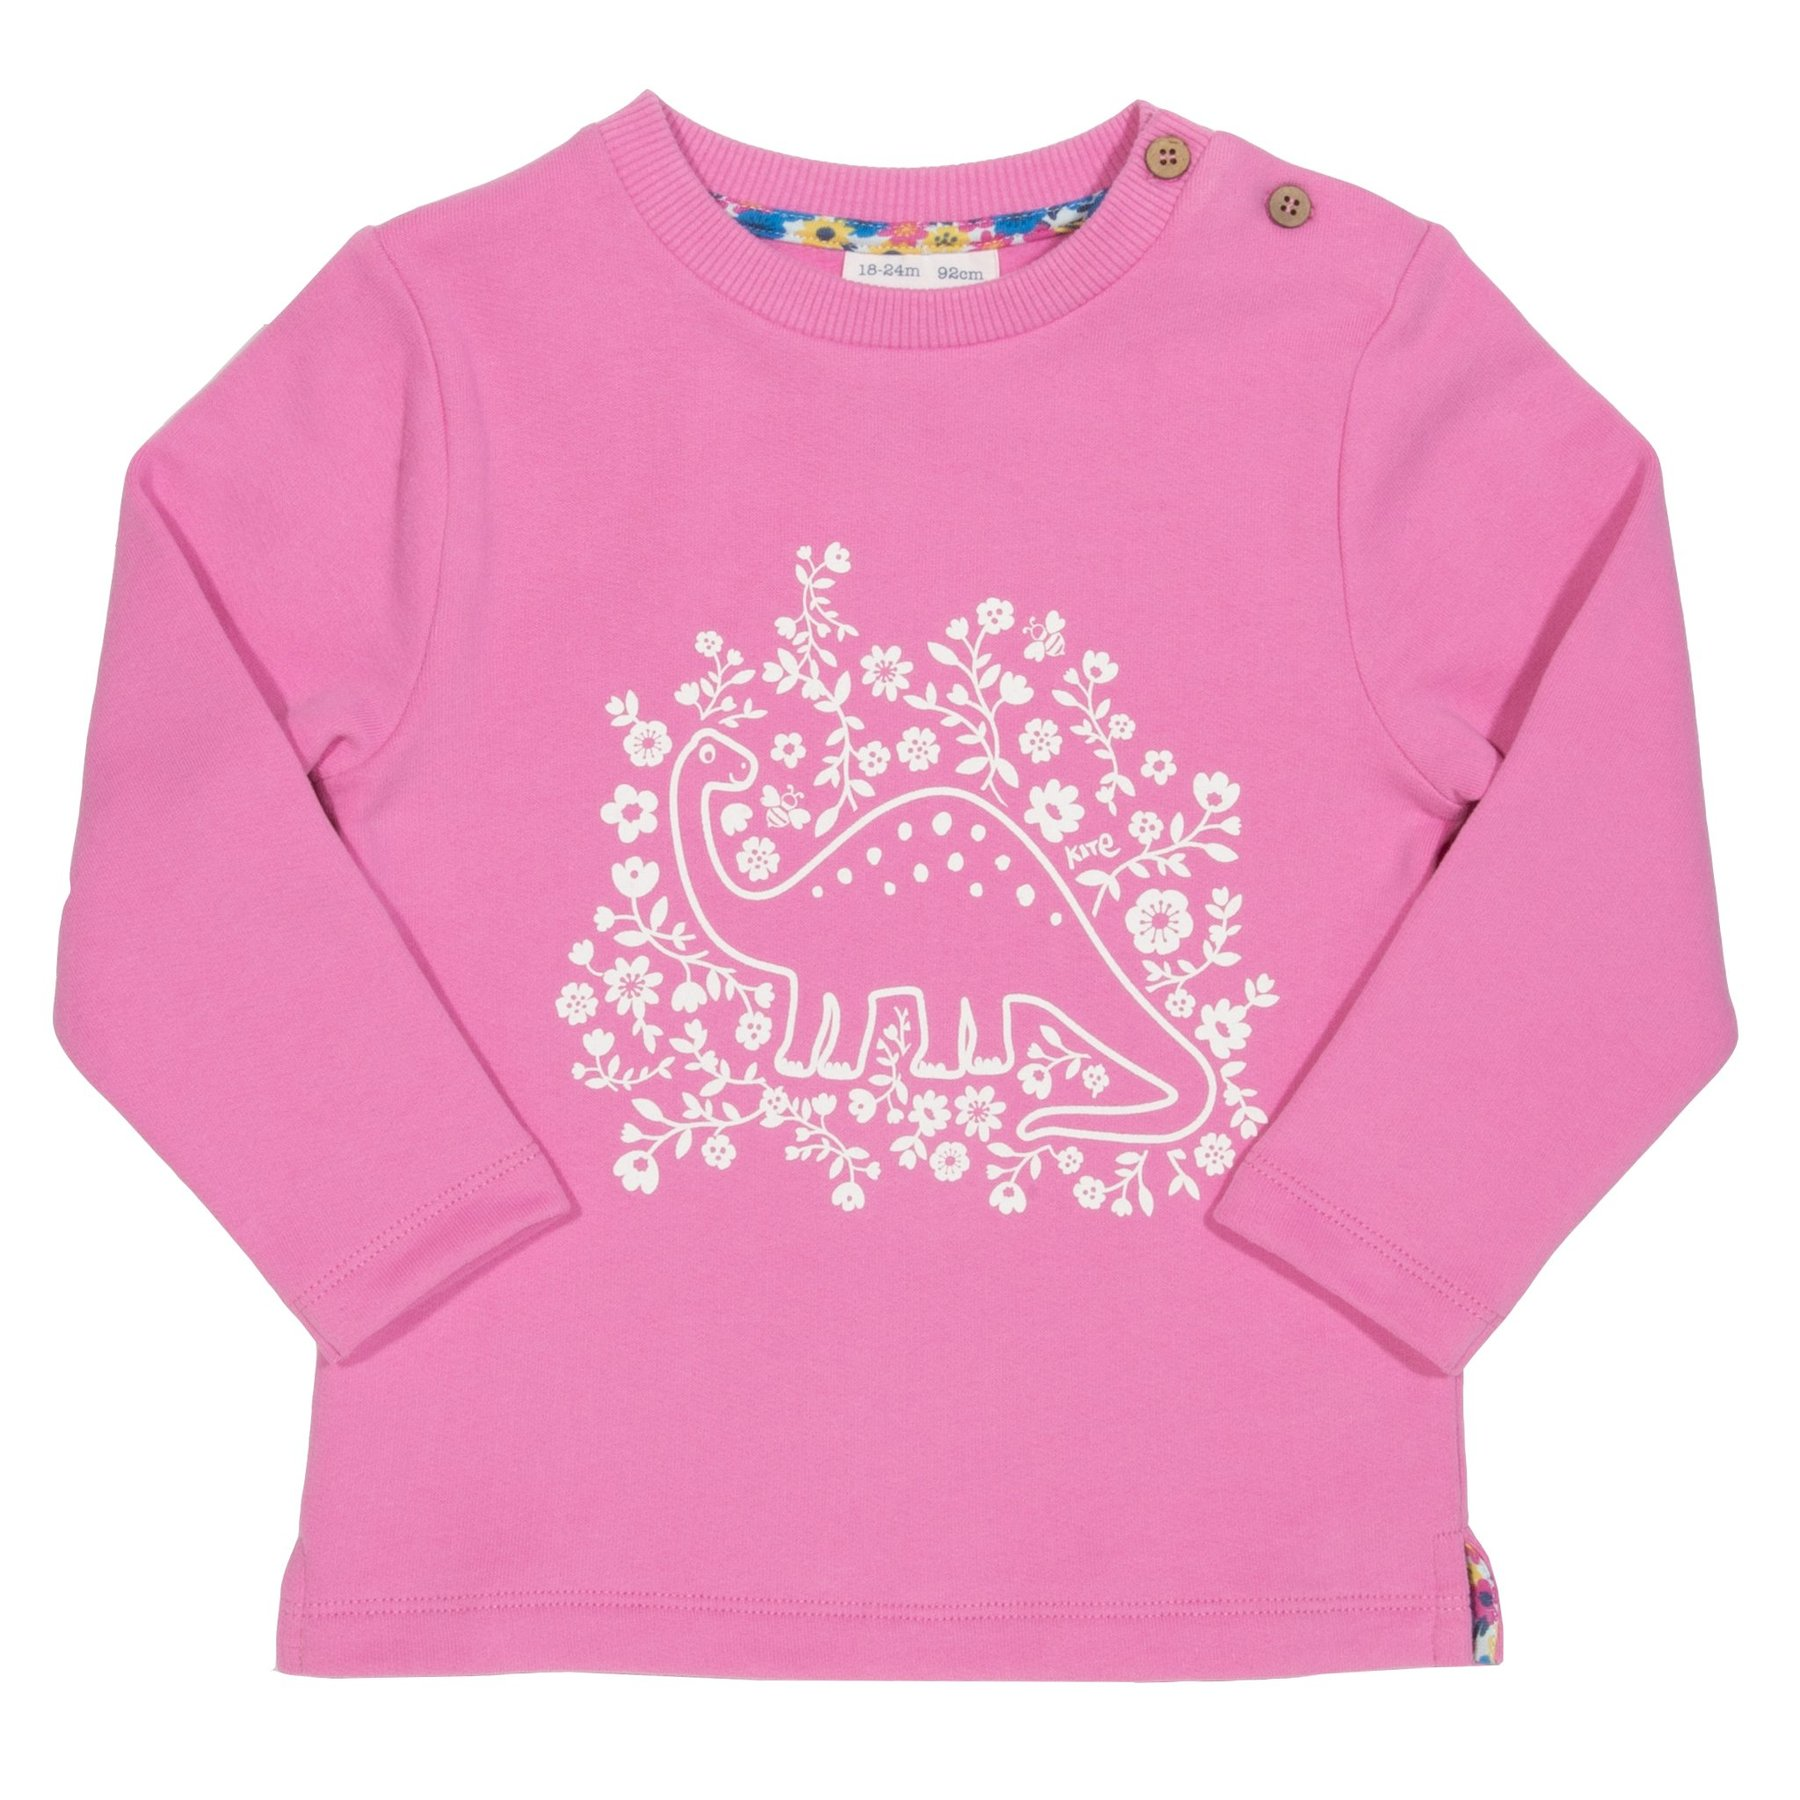 Kite Flora-Saurus Sweatshirt